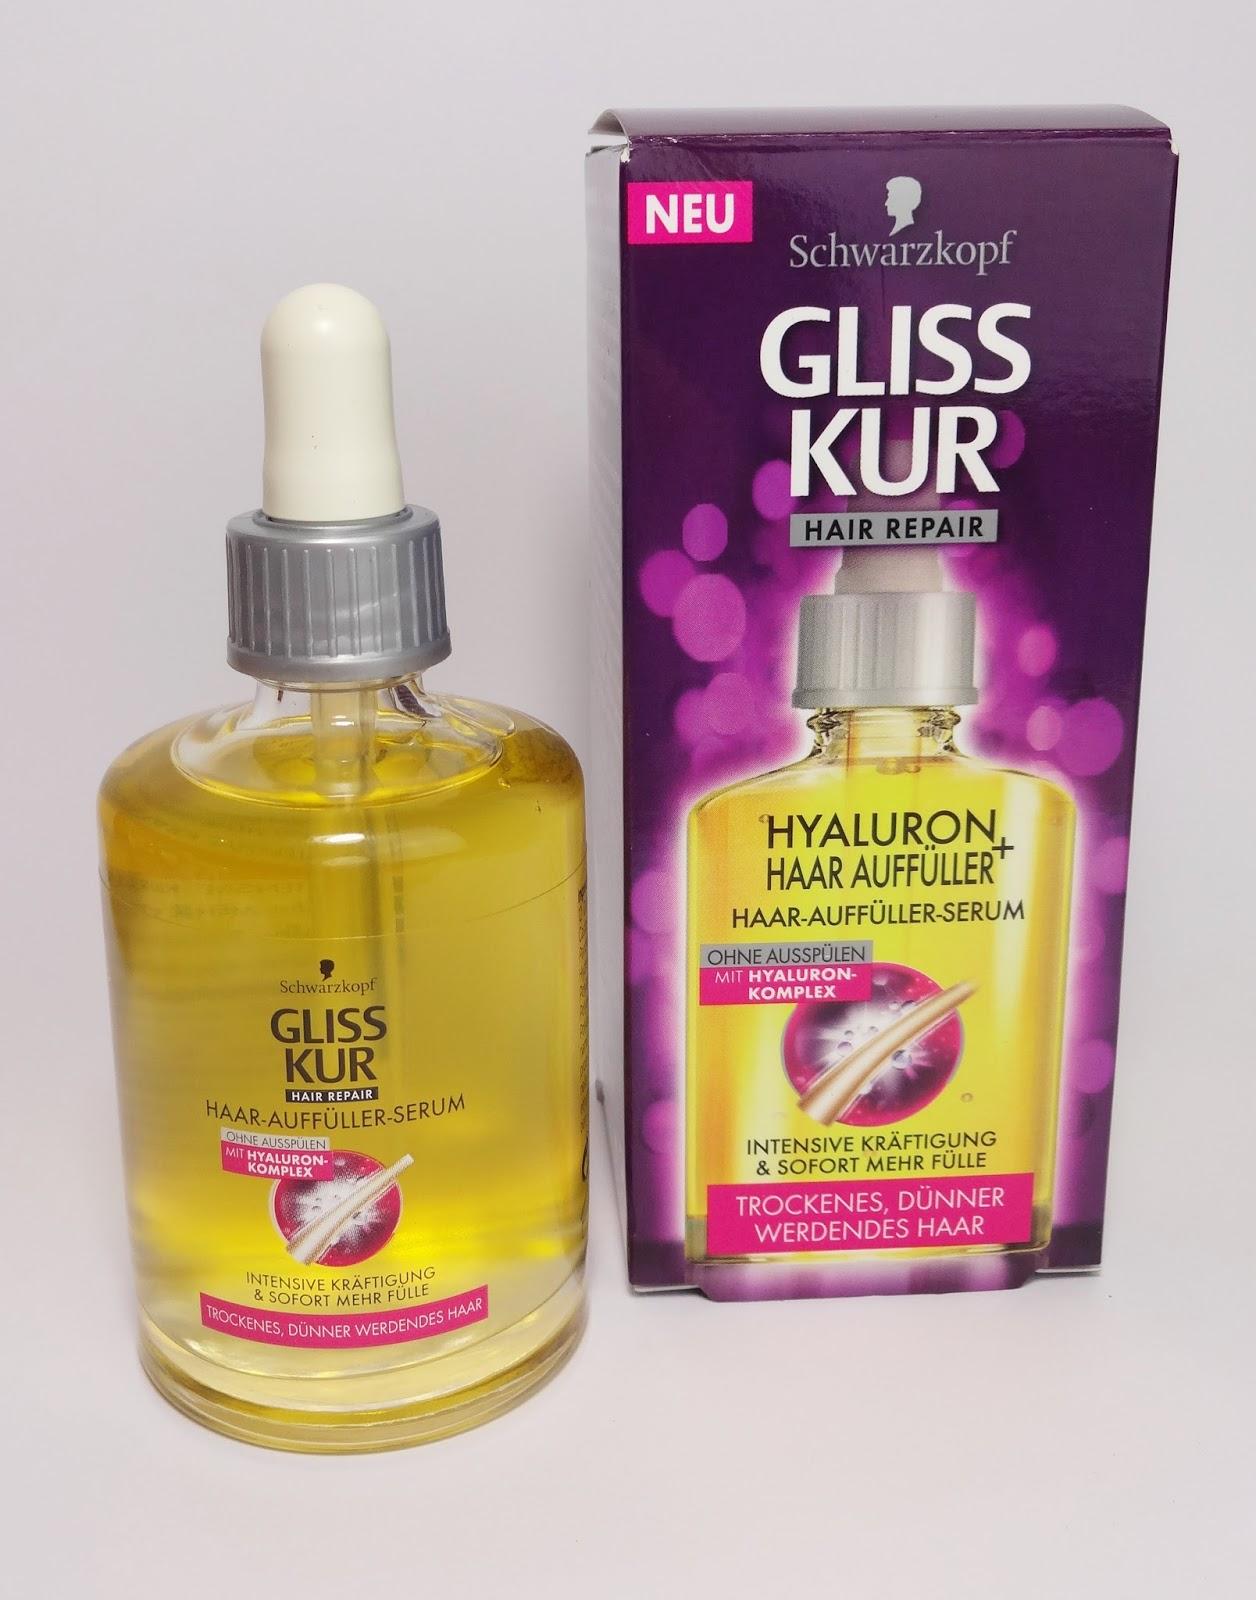 Gliss Kur - Hyaluron Haar Auffüller Serum